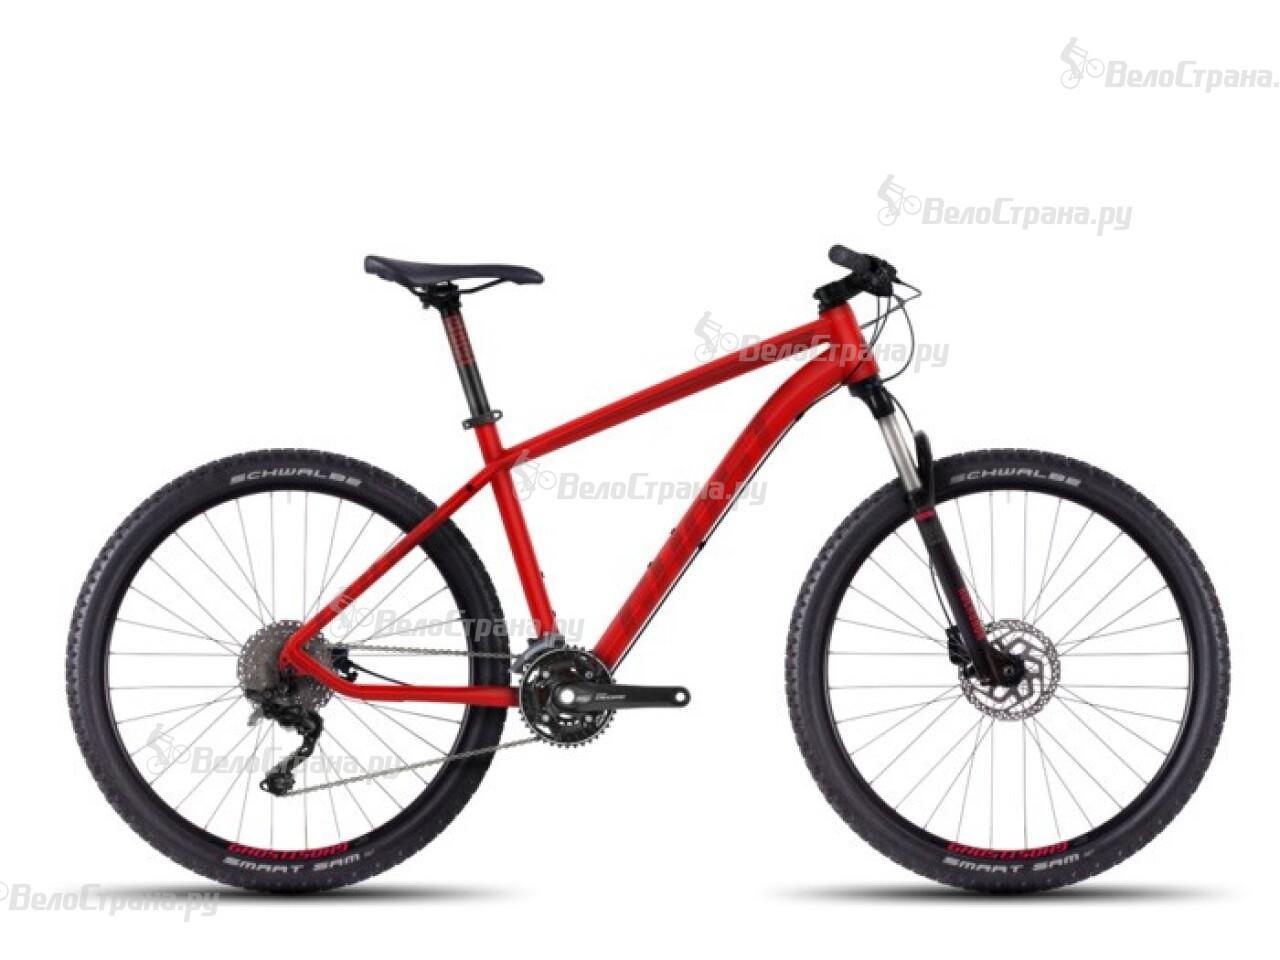 Велосипед Ghost Kato 7 (2016) цены онлайн